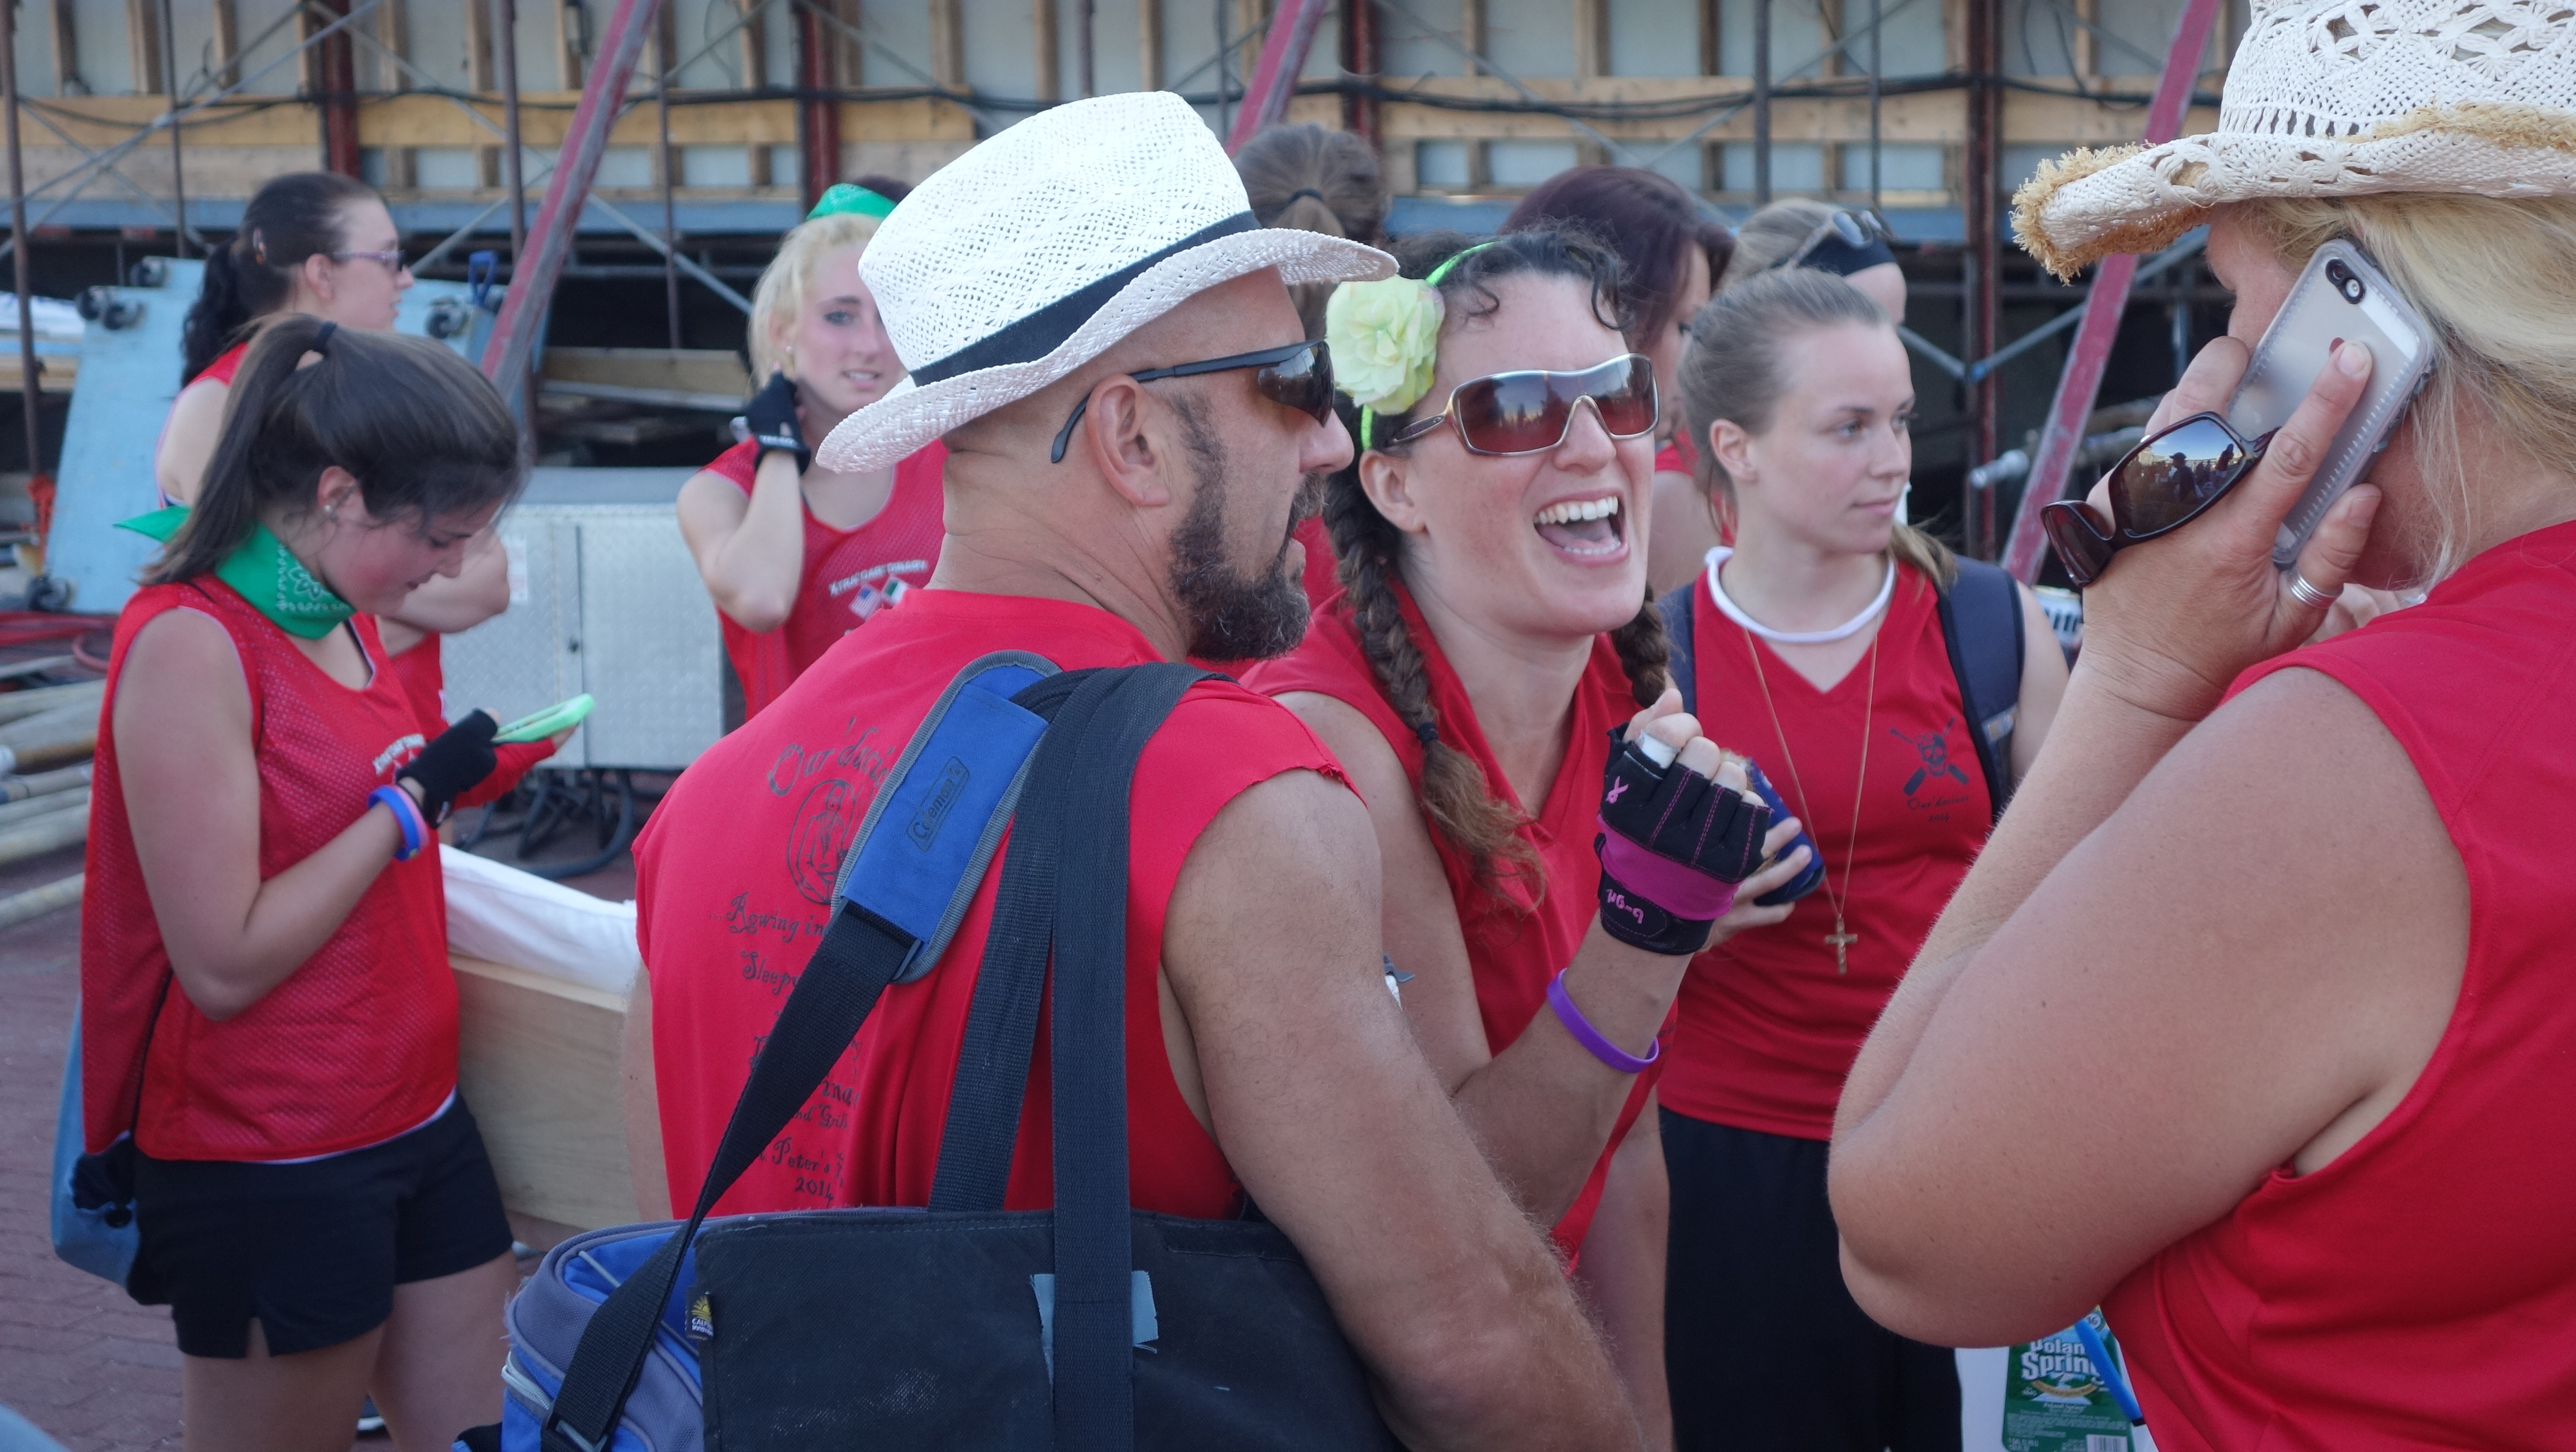 Amanda Race St. Peter's Fiesta 2014 Camps! 387